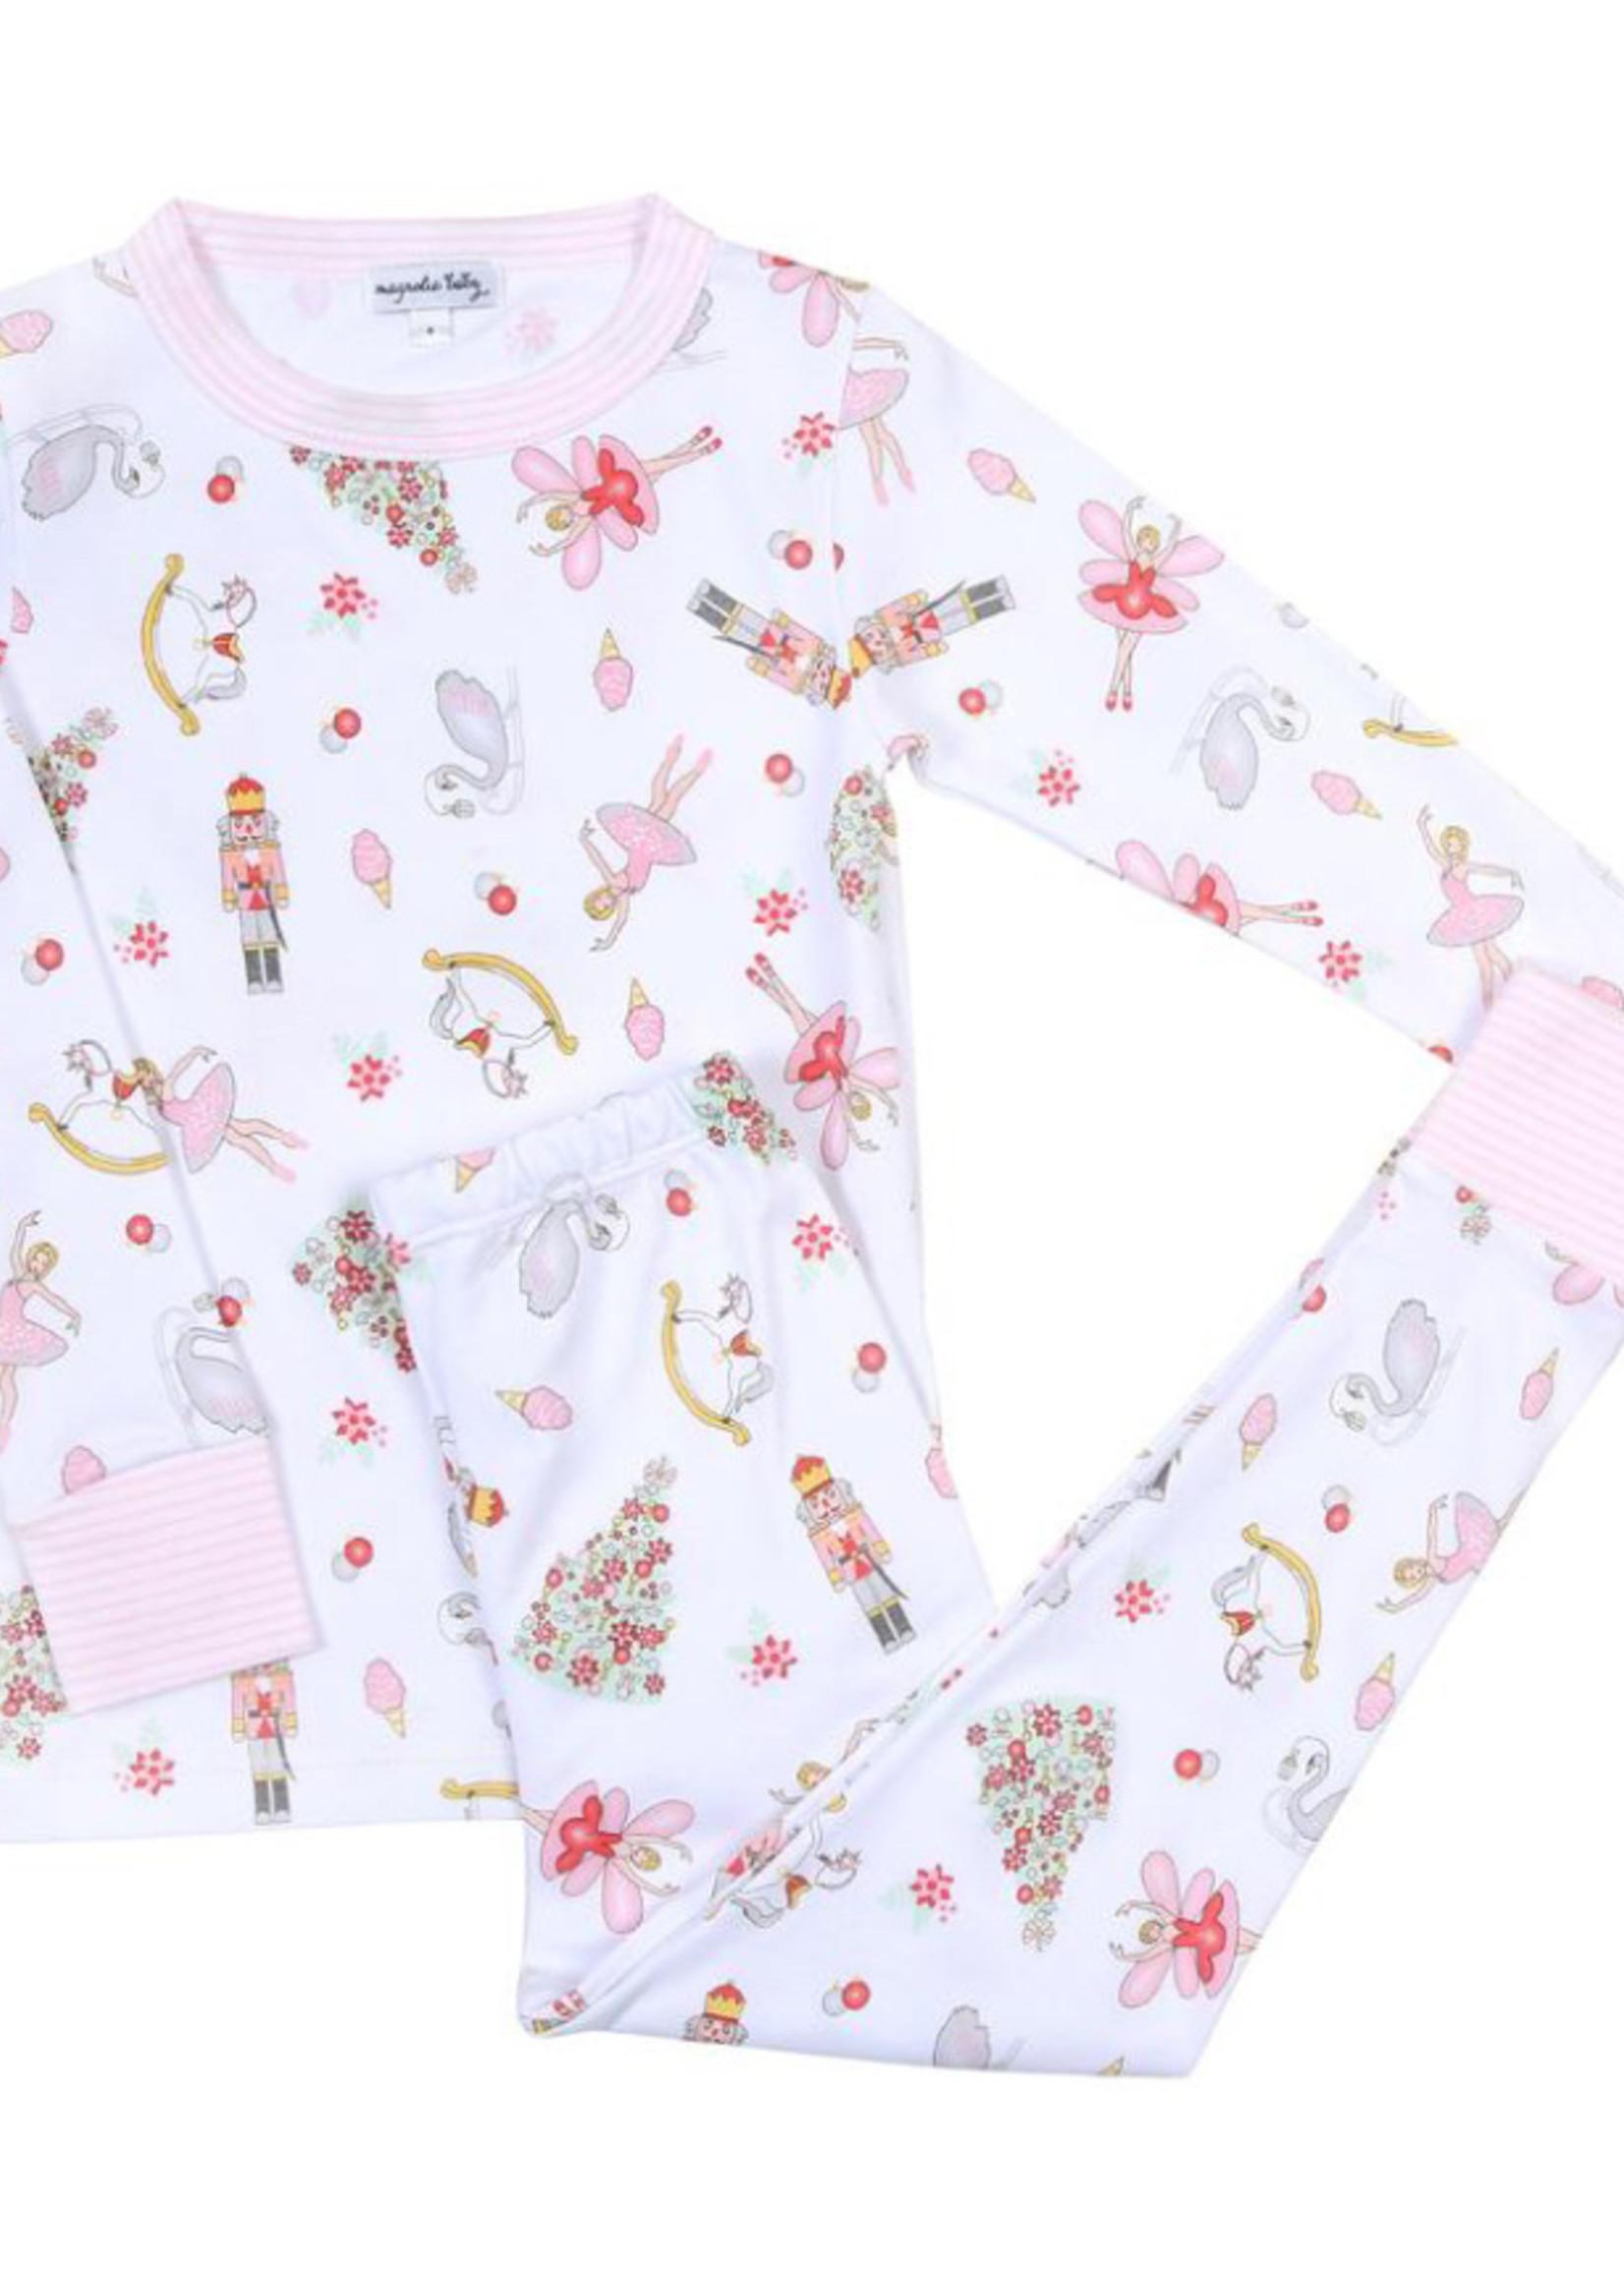 magnolia baby Nutcracker Long Pajamas